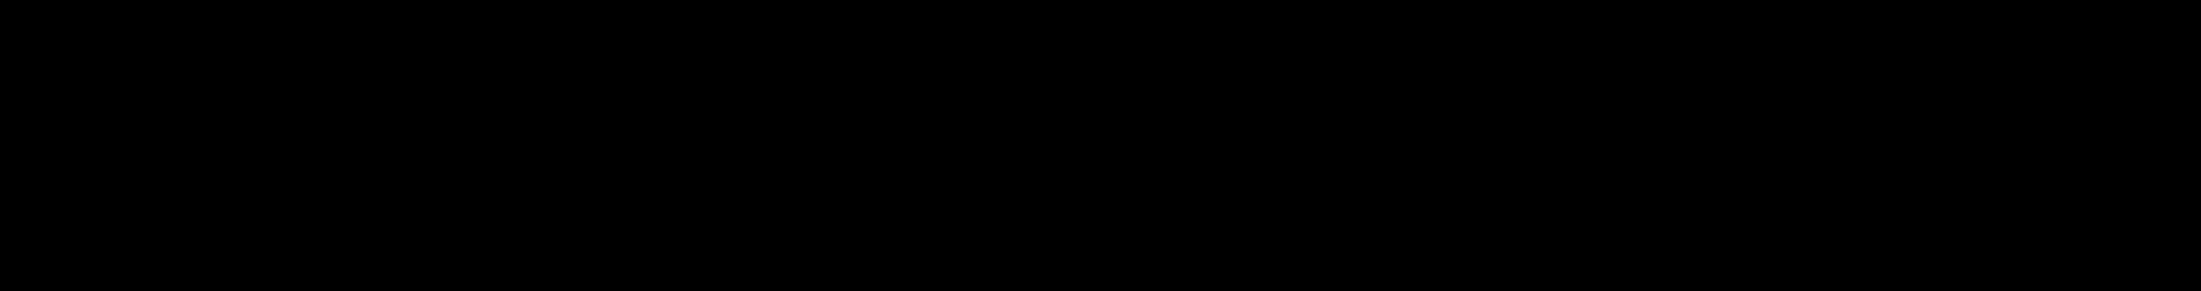 New York Times Logo Transparent Png.